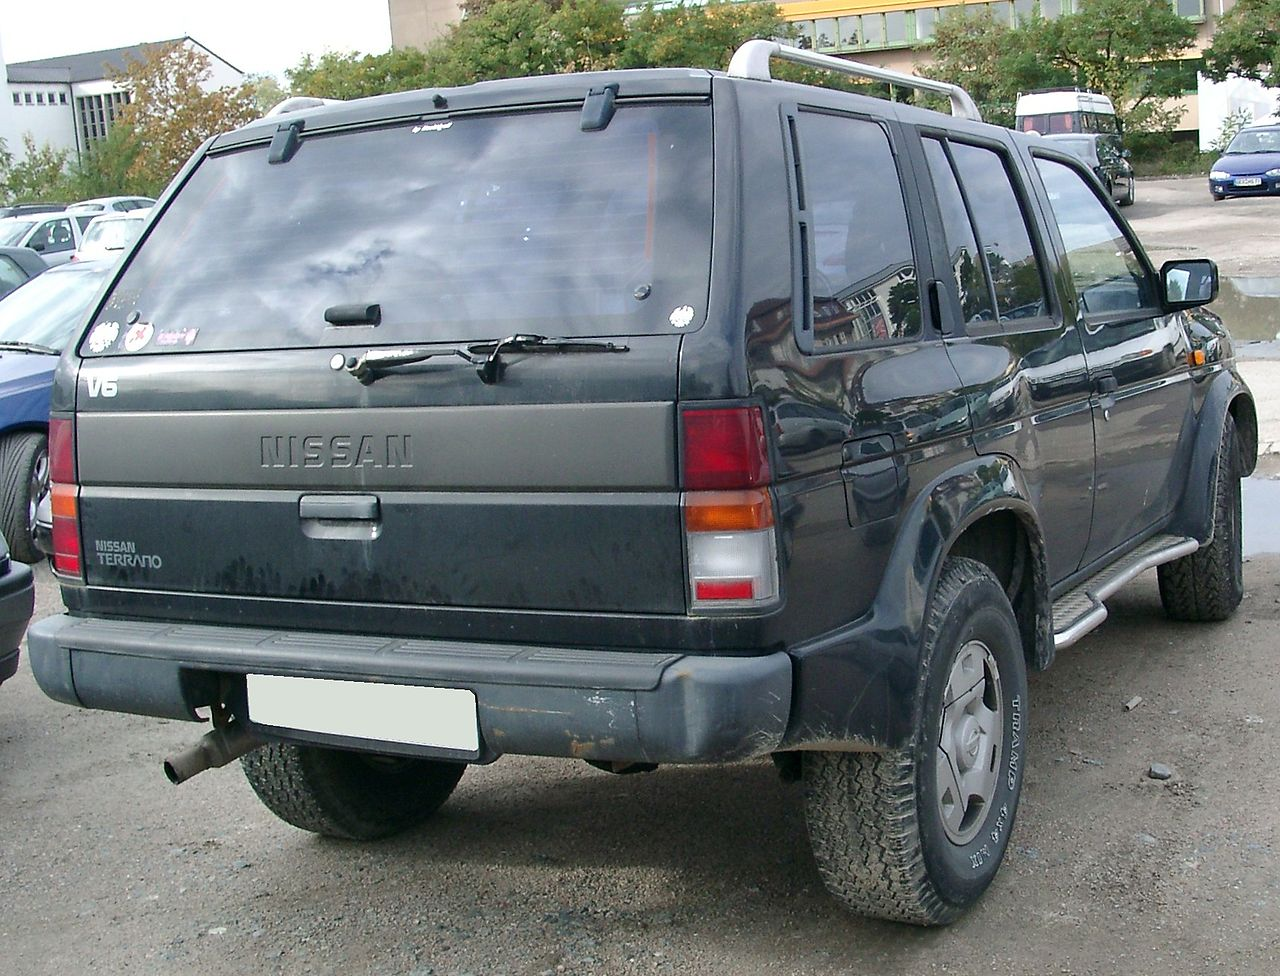 Nissan_Terrano_rear.jpg